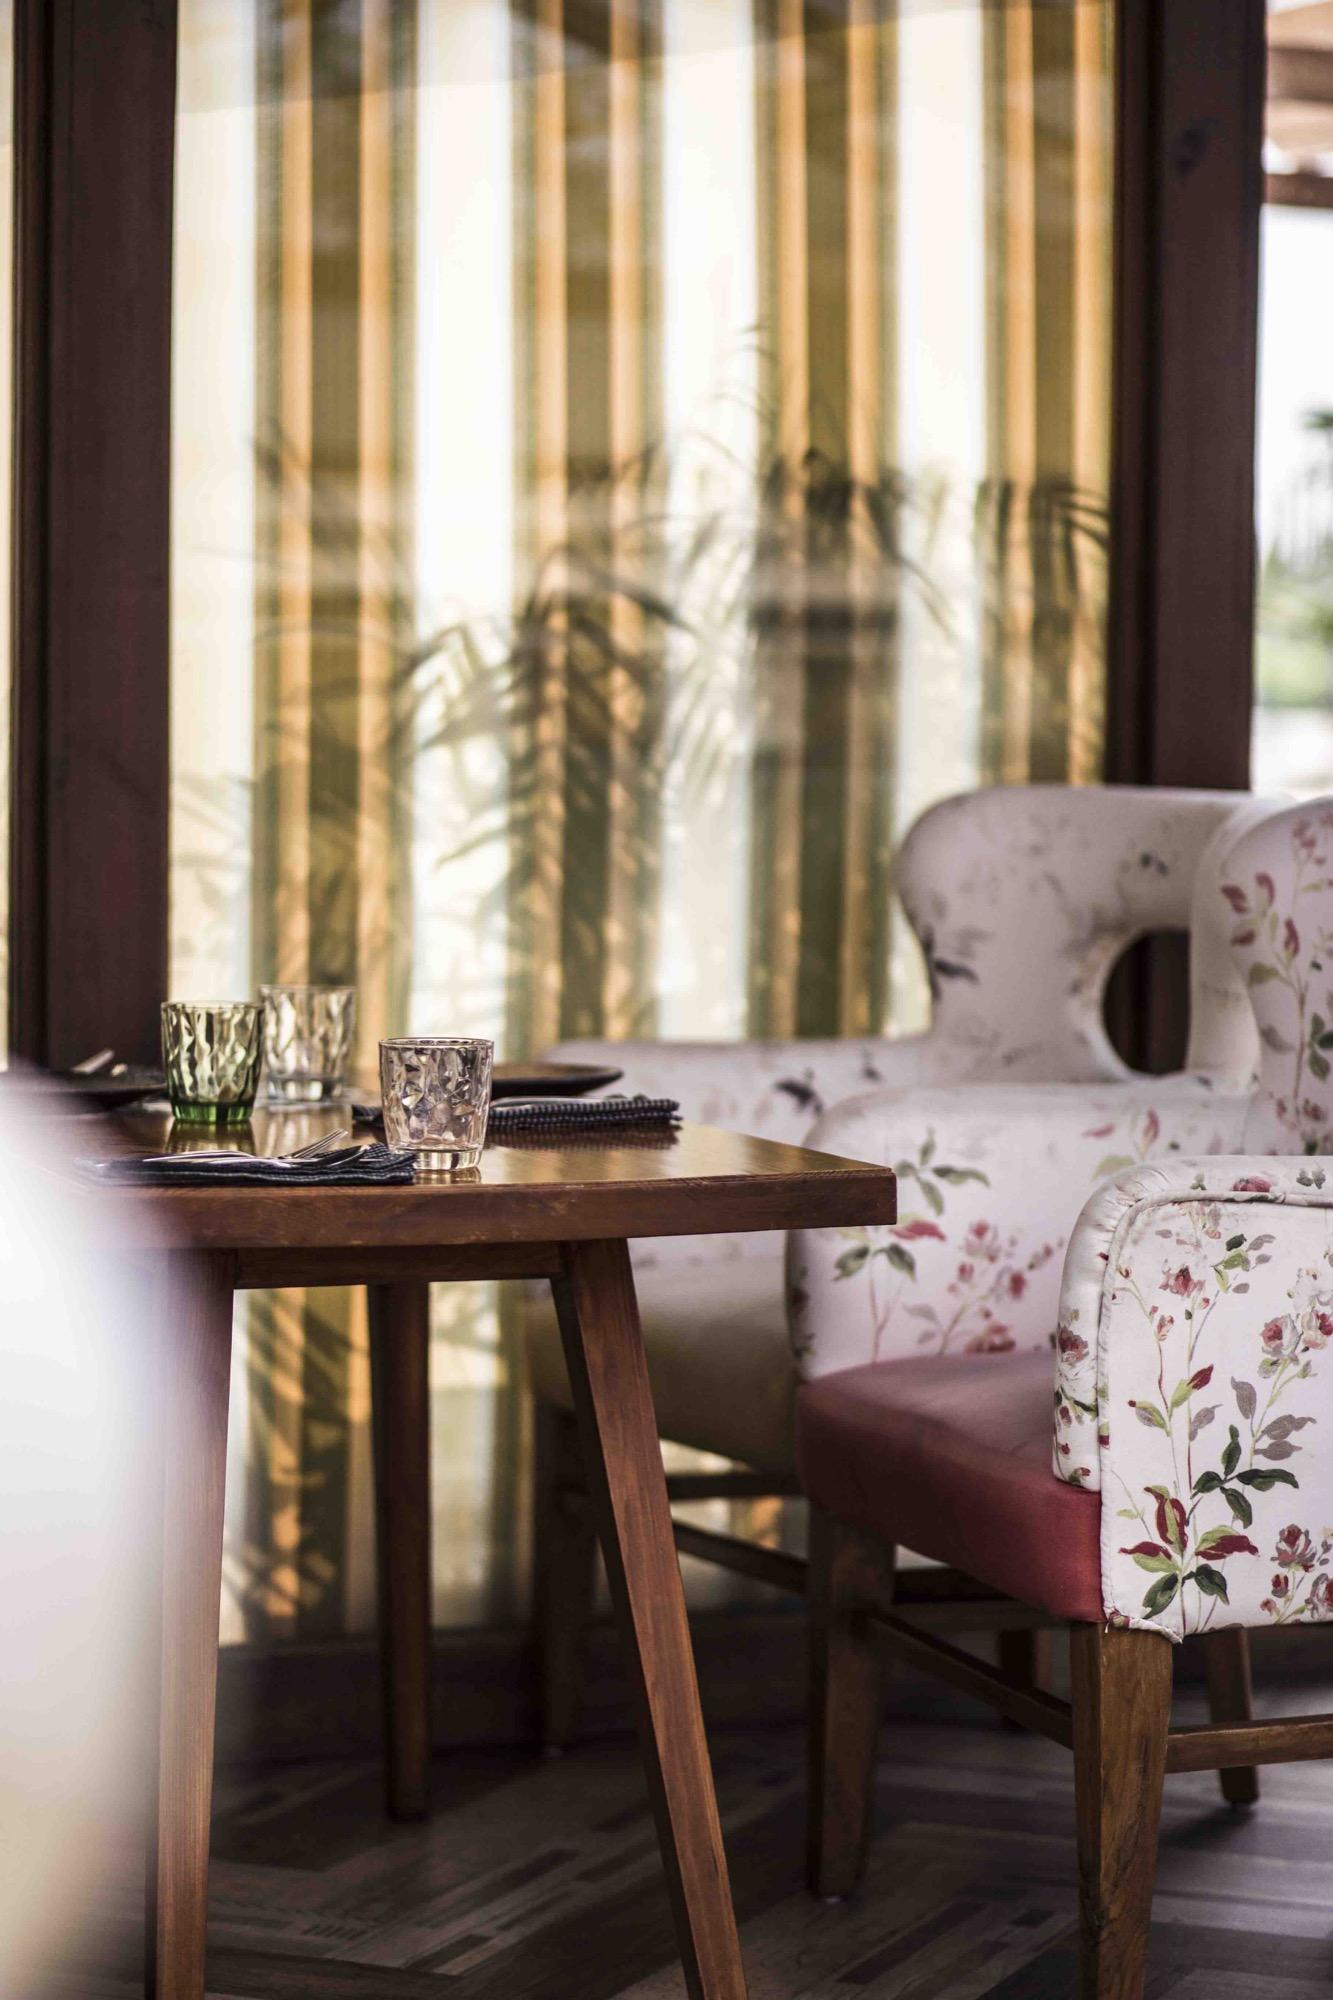 Best of Asia Village, Interior design for a restaurant at Delhi by Aspire Designs 15